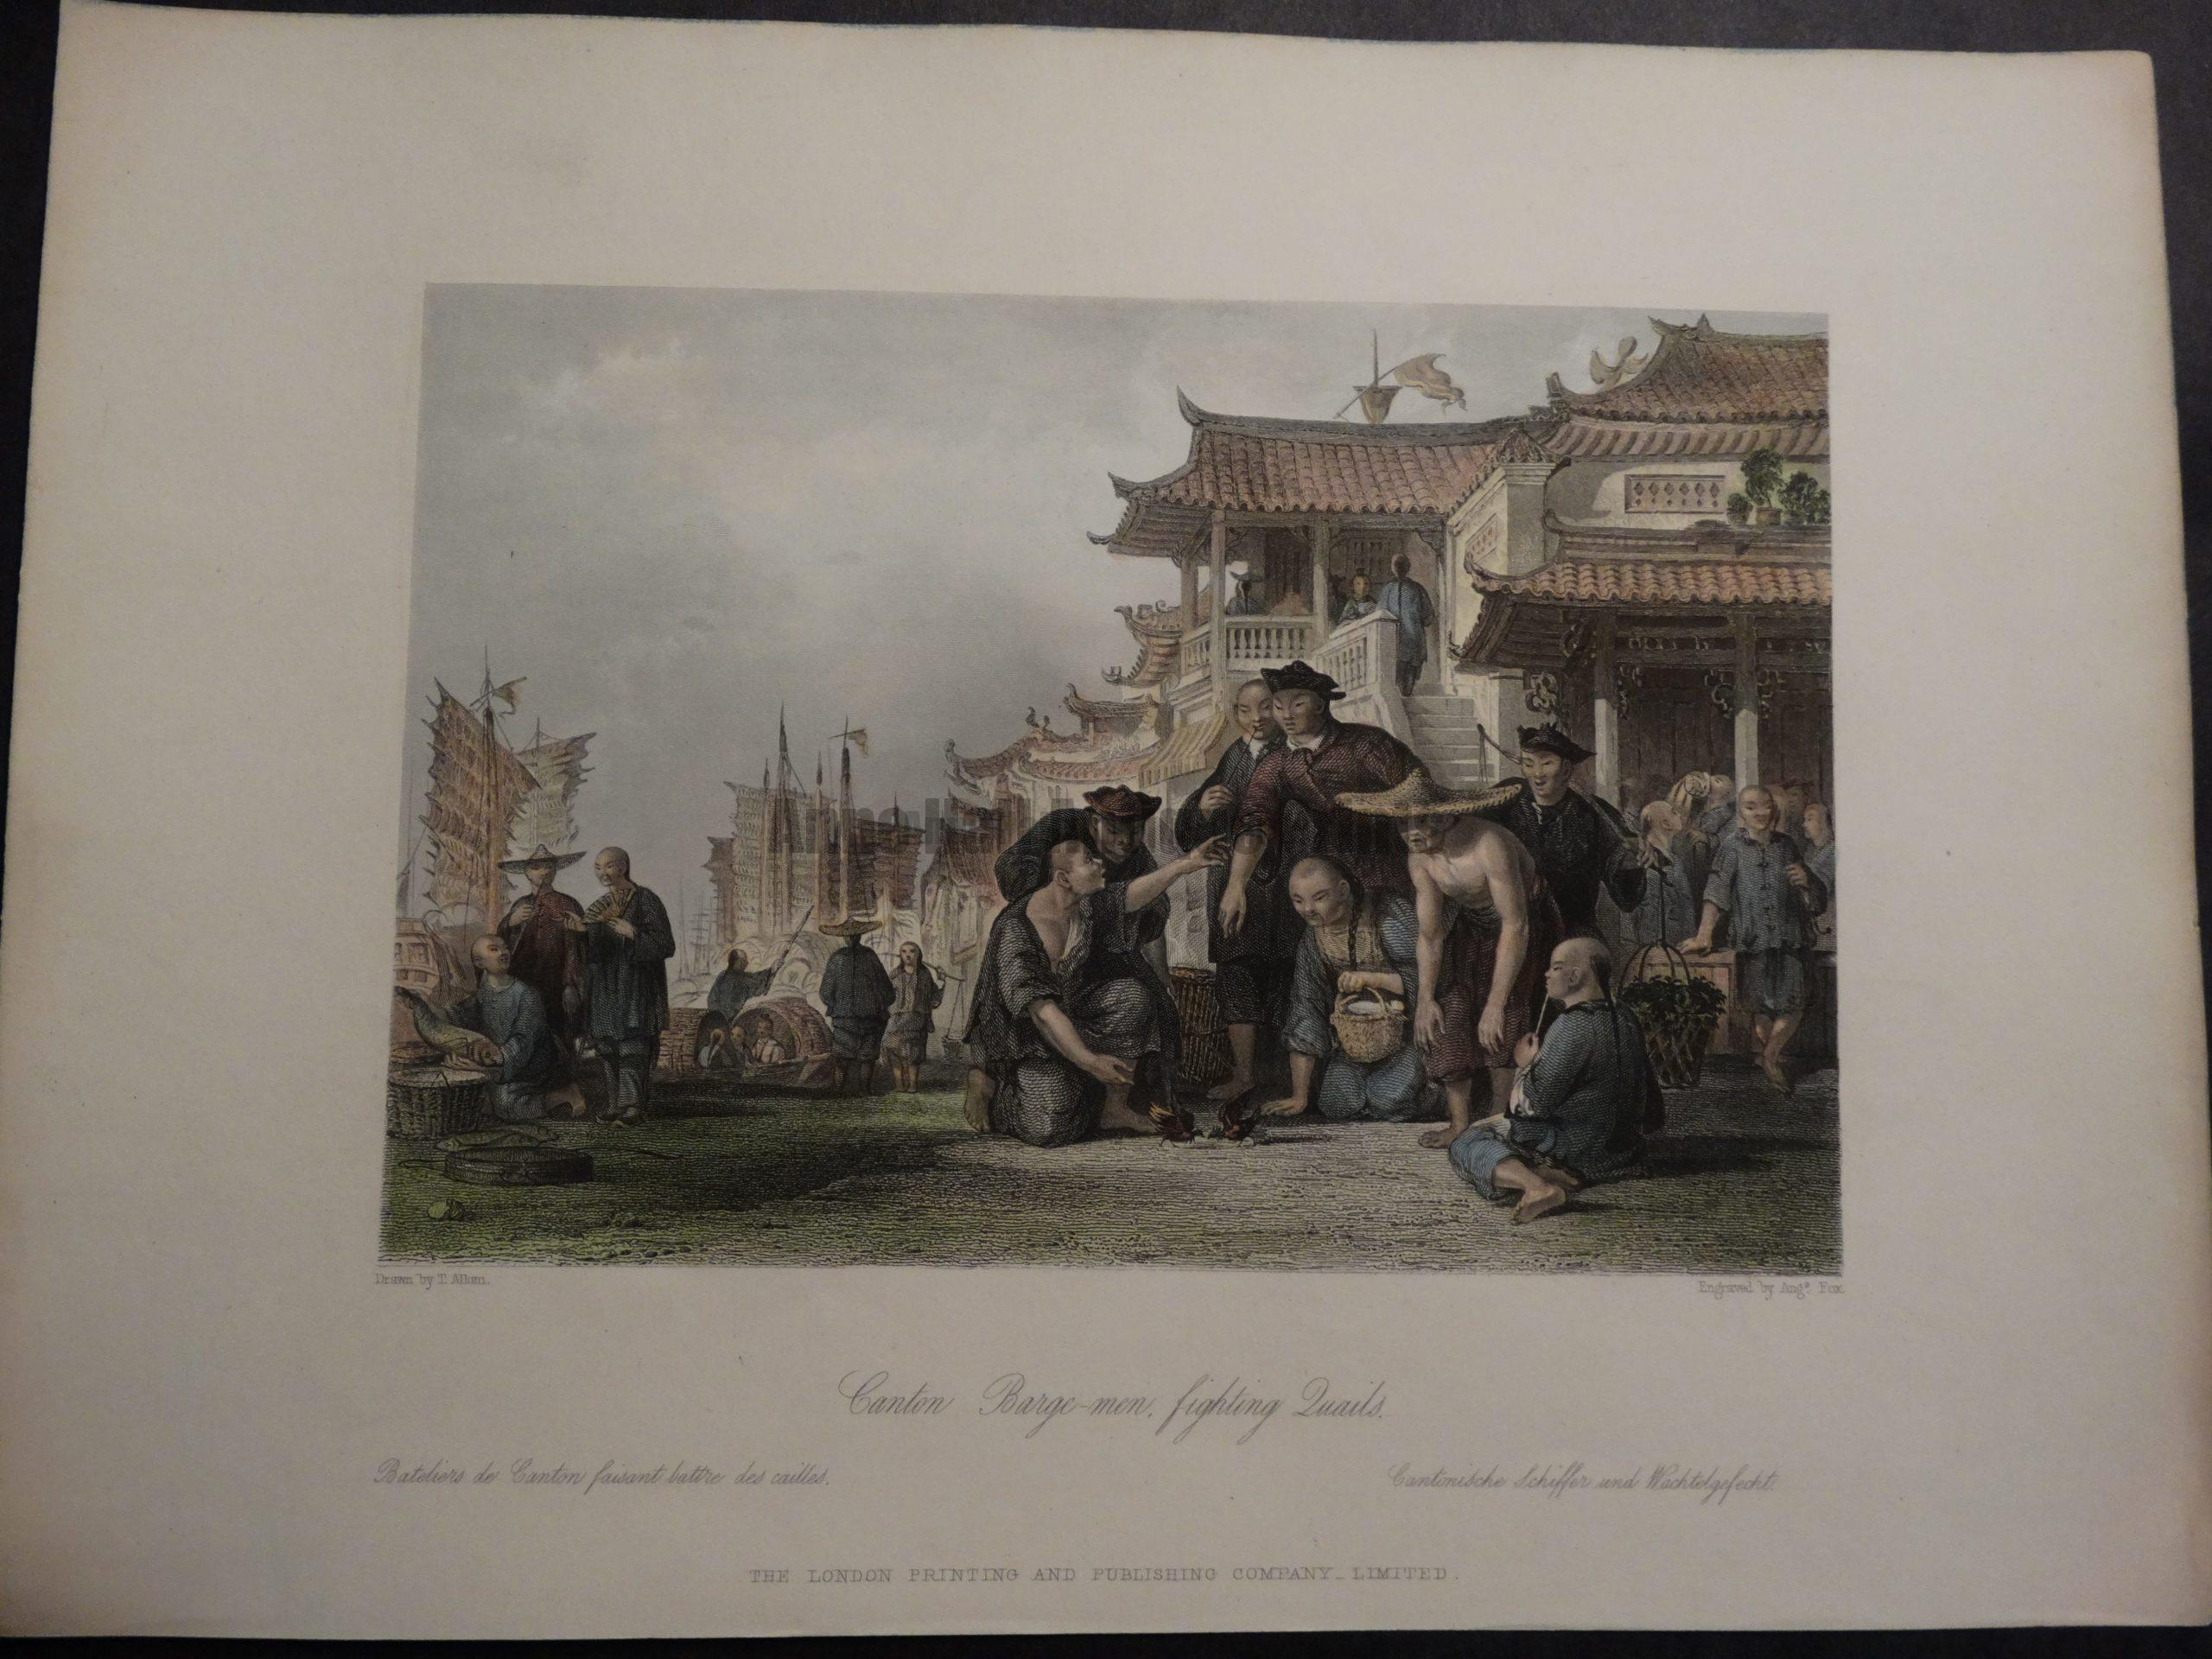 DSC02397 Canton Barge-men, fighting quails.. Thomas Allom 1855 hand colored engraving $150.